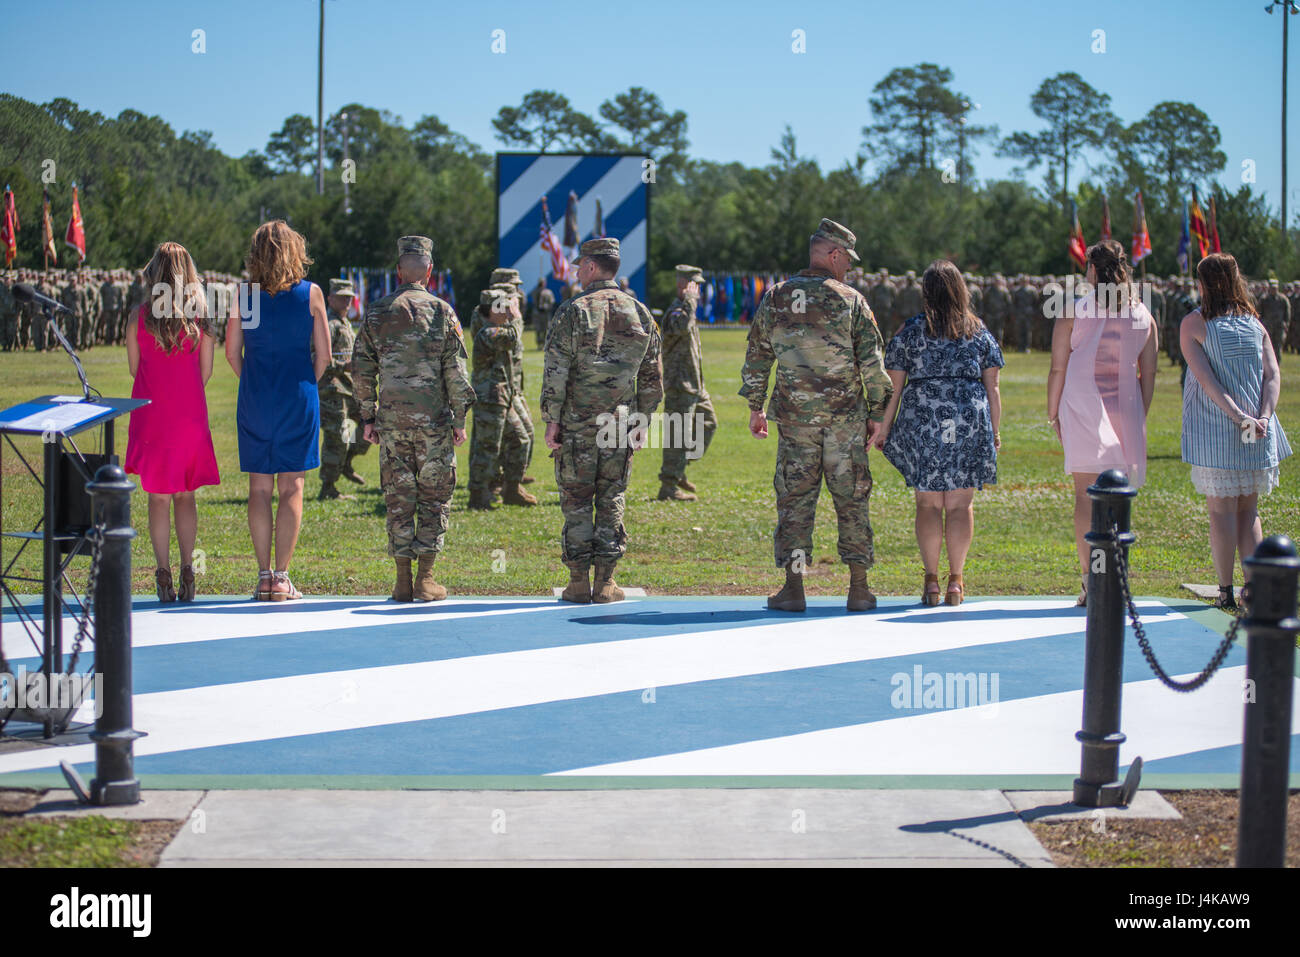 Maj. Gen. Leopoldo Quintas and his family, left, Gen. Robert Abrams and his wife, center, and Maj. Gen. James Rainey - Stock Image